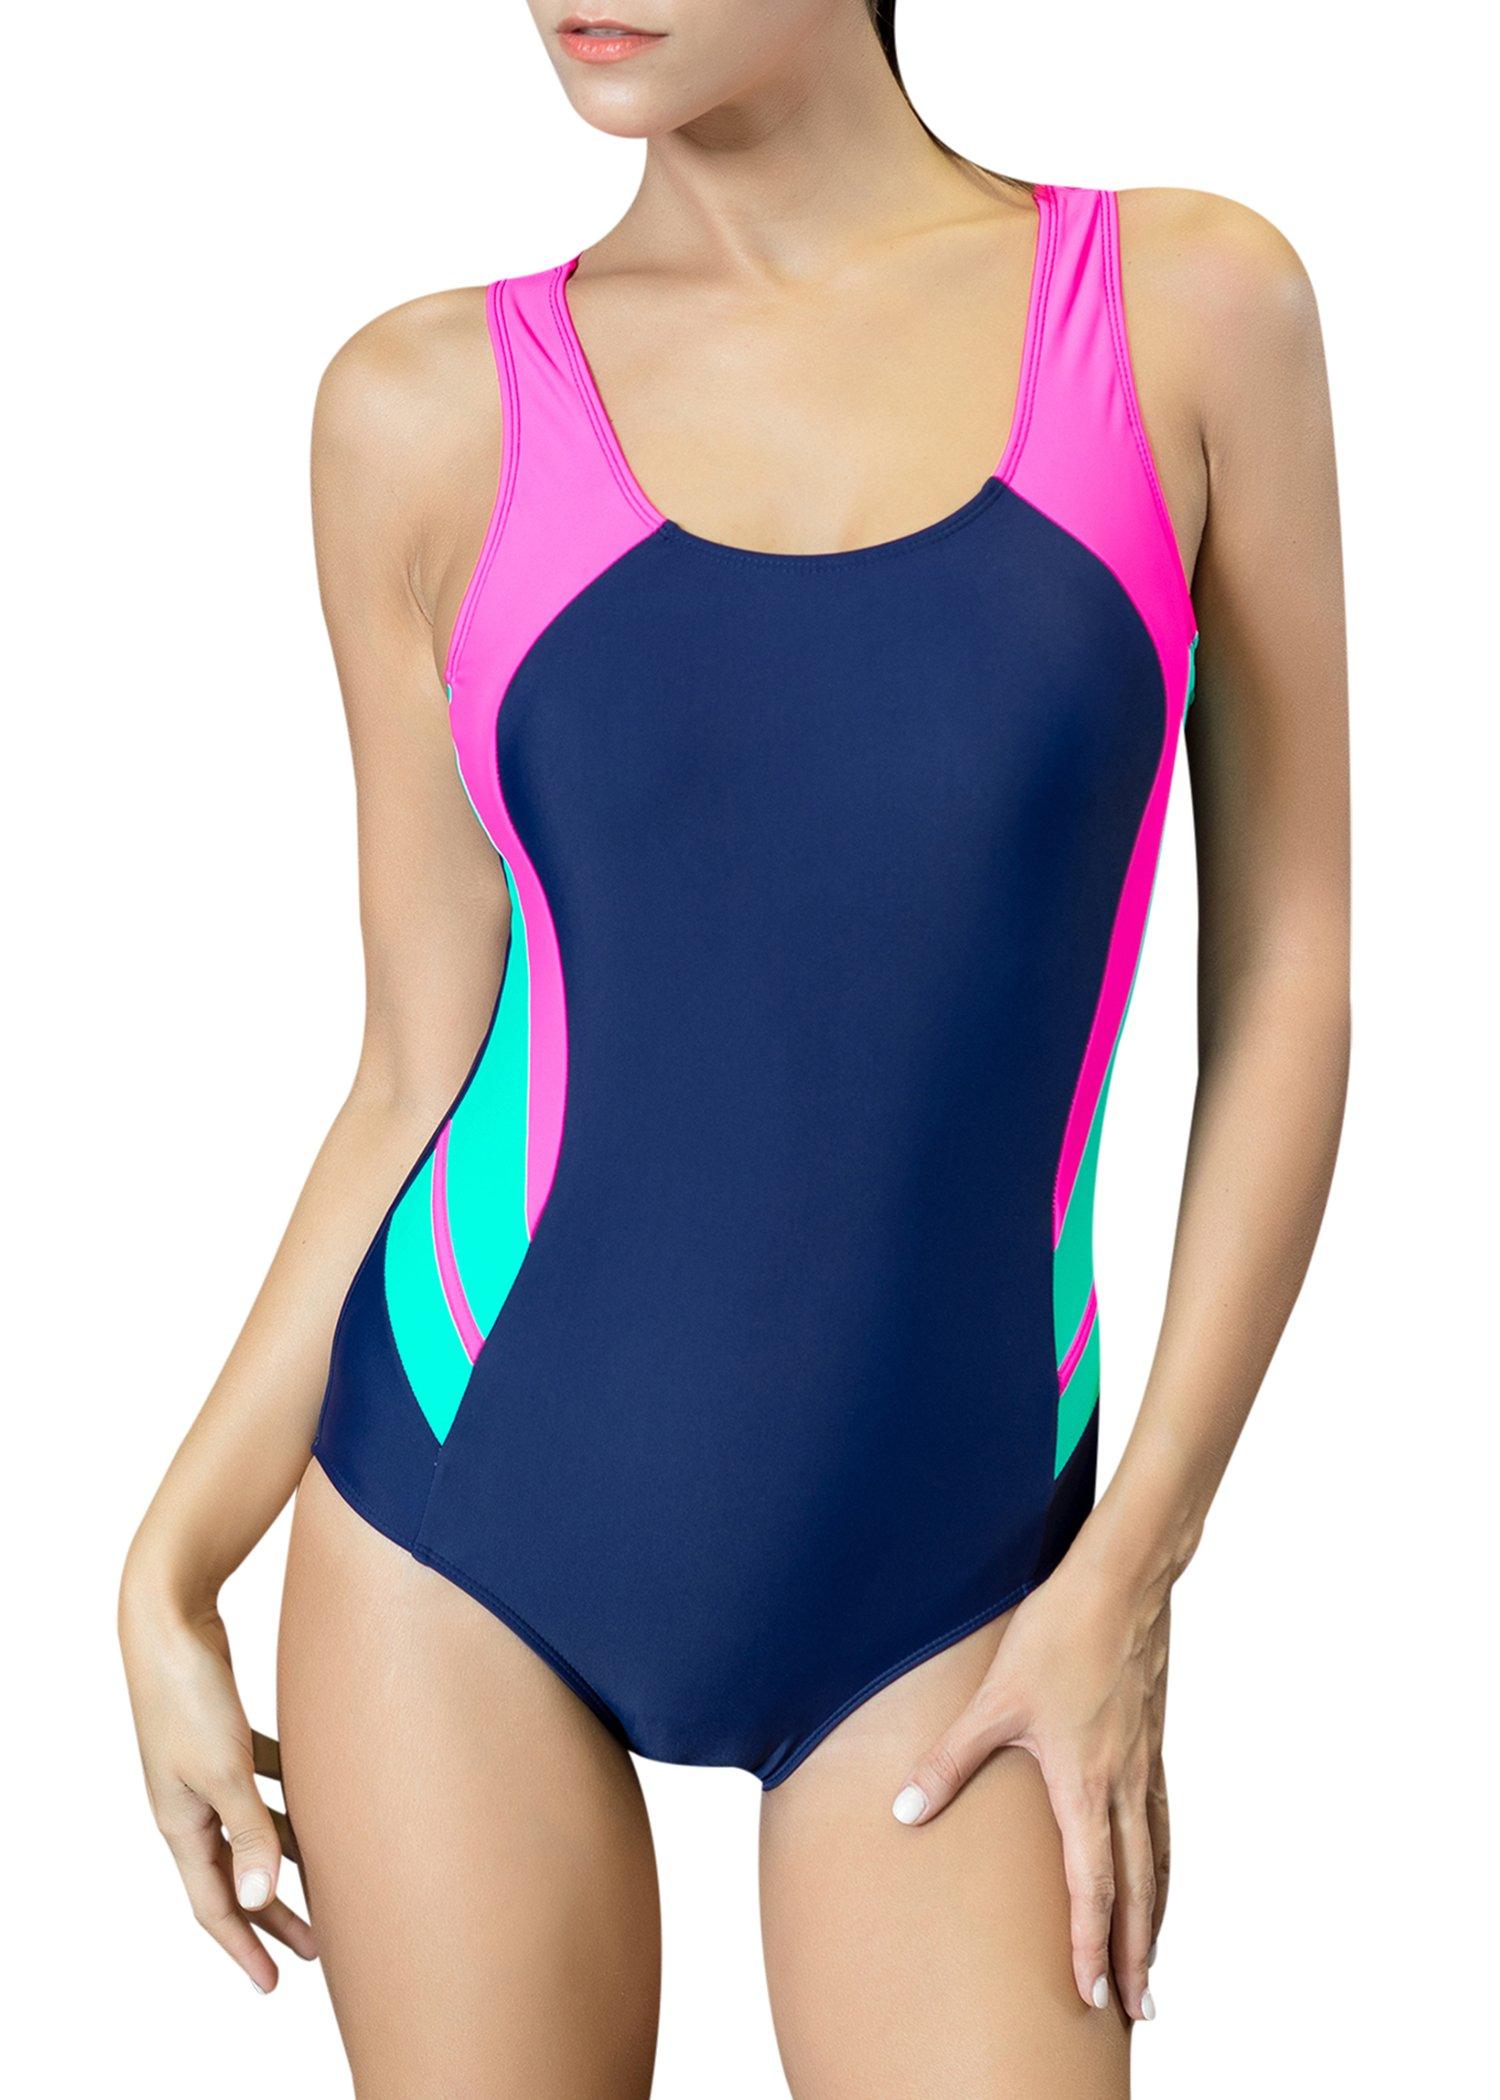 Uhnice Women's One Piece Swimsuits Racing Training Sports Athletic Swimwear (Medium(US6-8), Black/Pink)